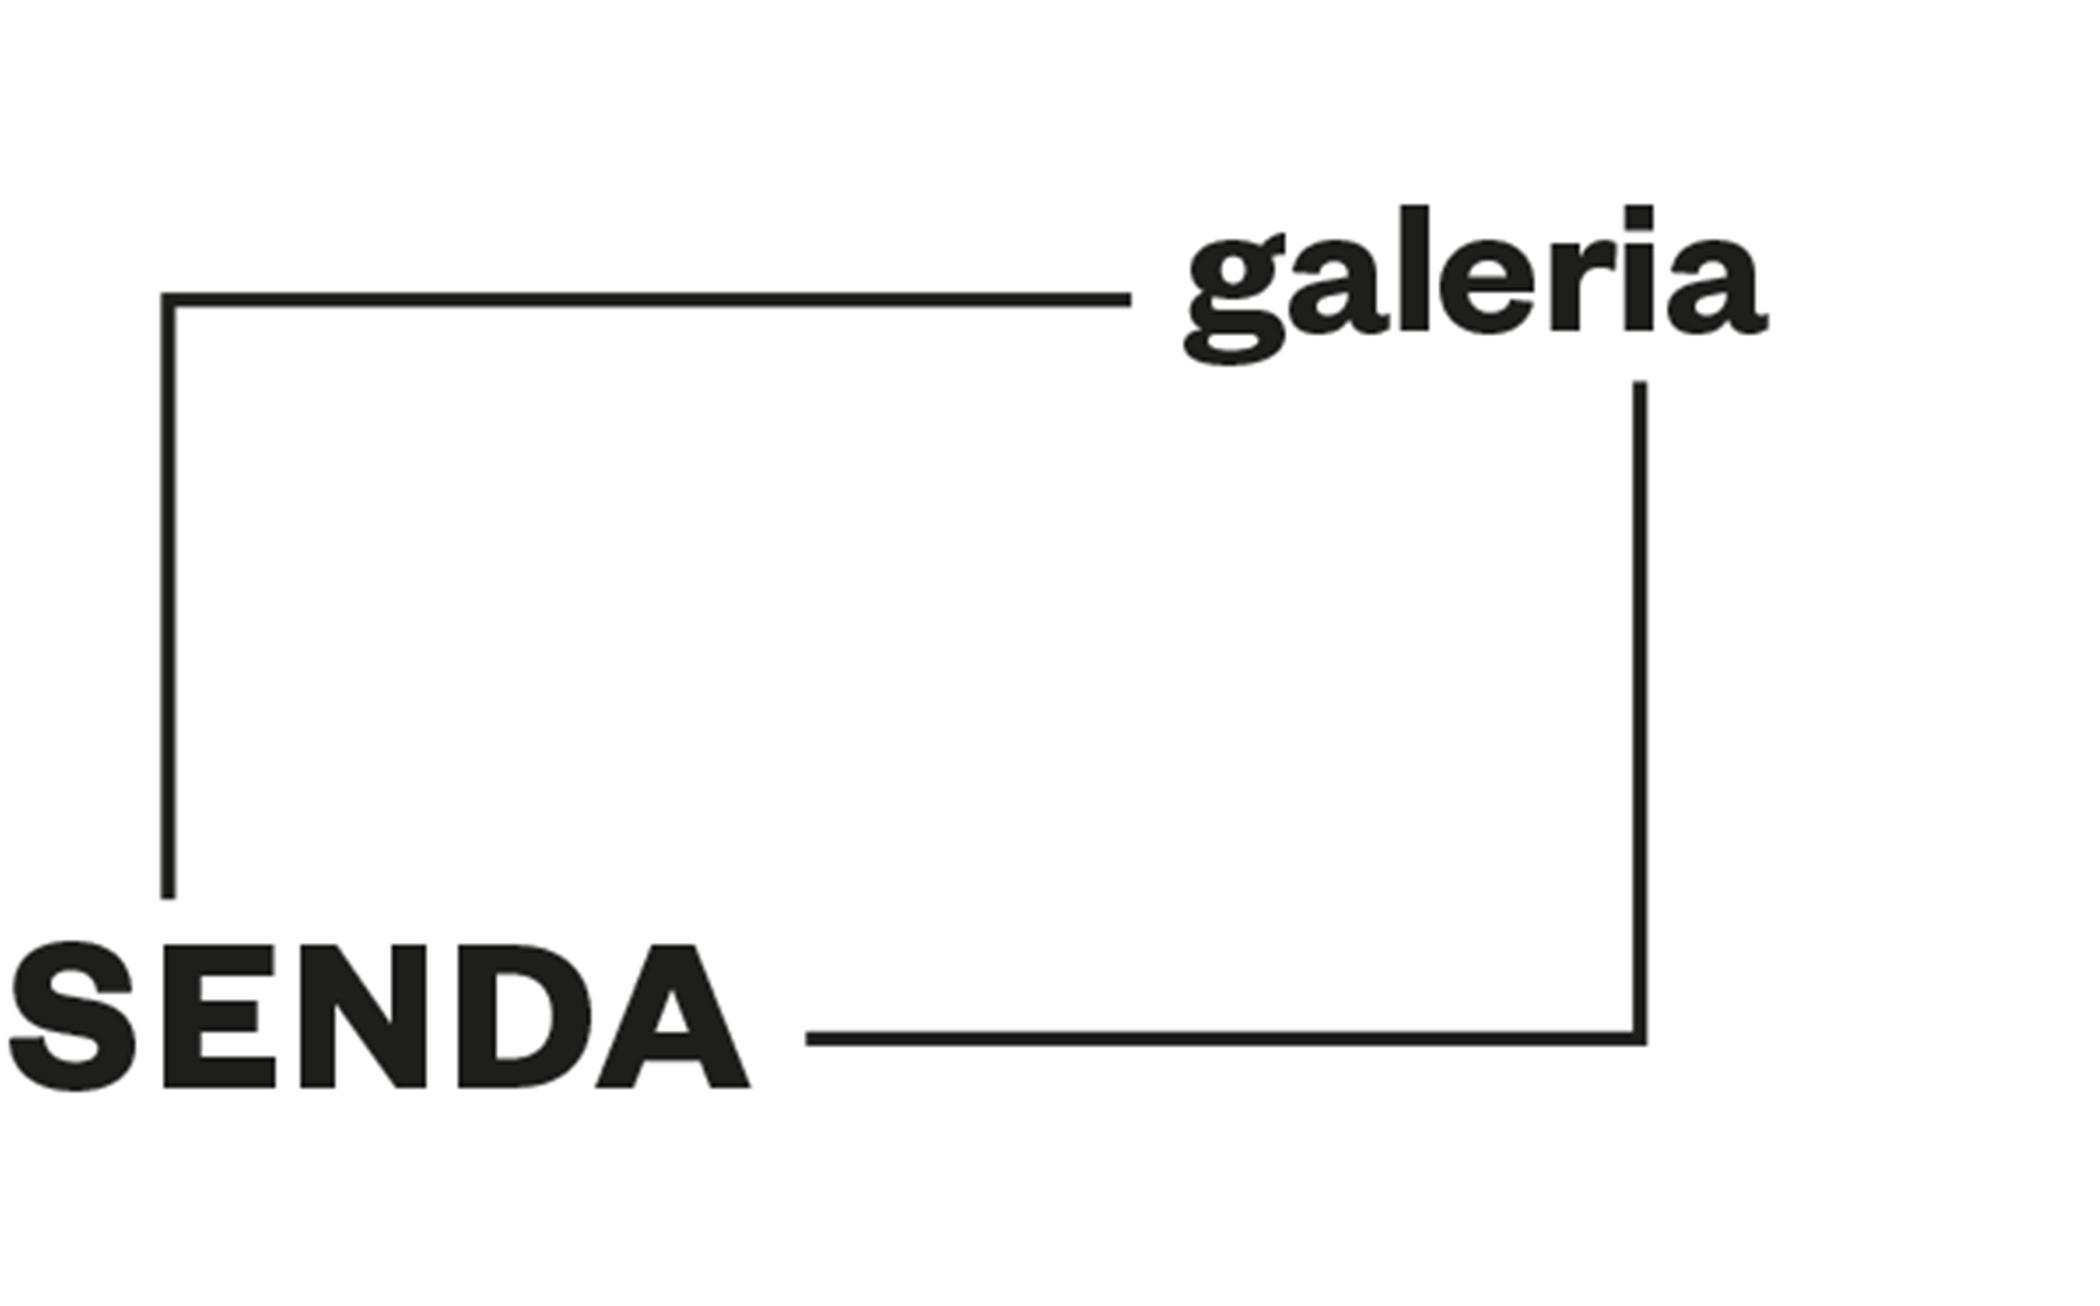 Galeria SENDA   C/Trafalgar 32, 08010 Barcelona                      +34 93 487 6759     www.galeriasenda.com      info@galeriasenda.com